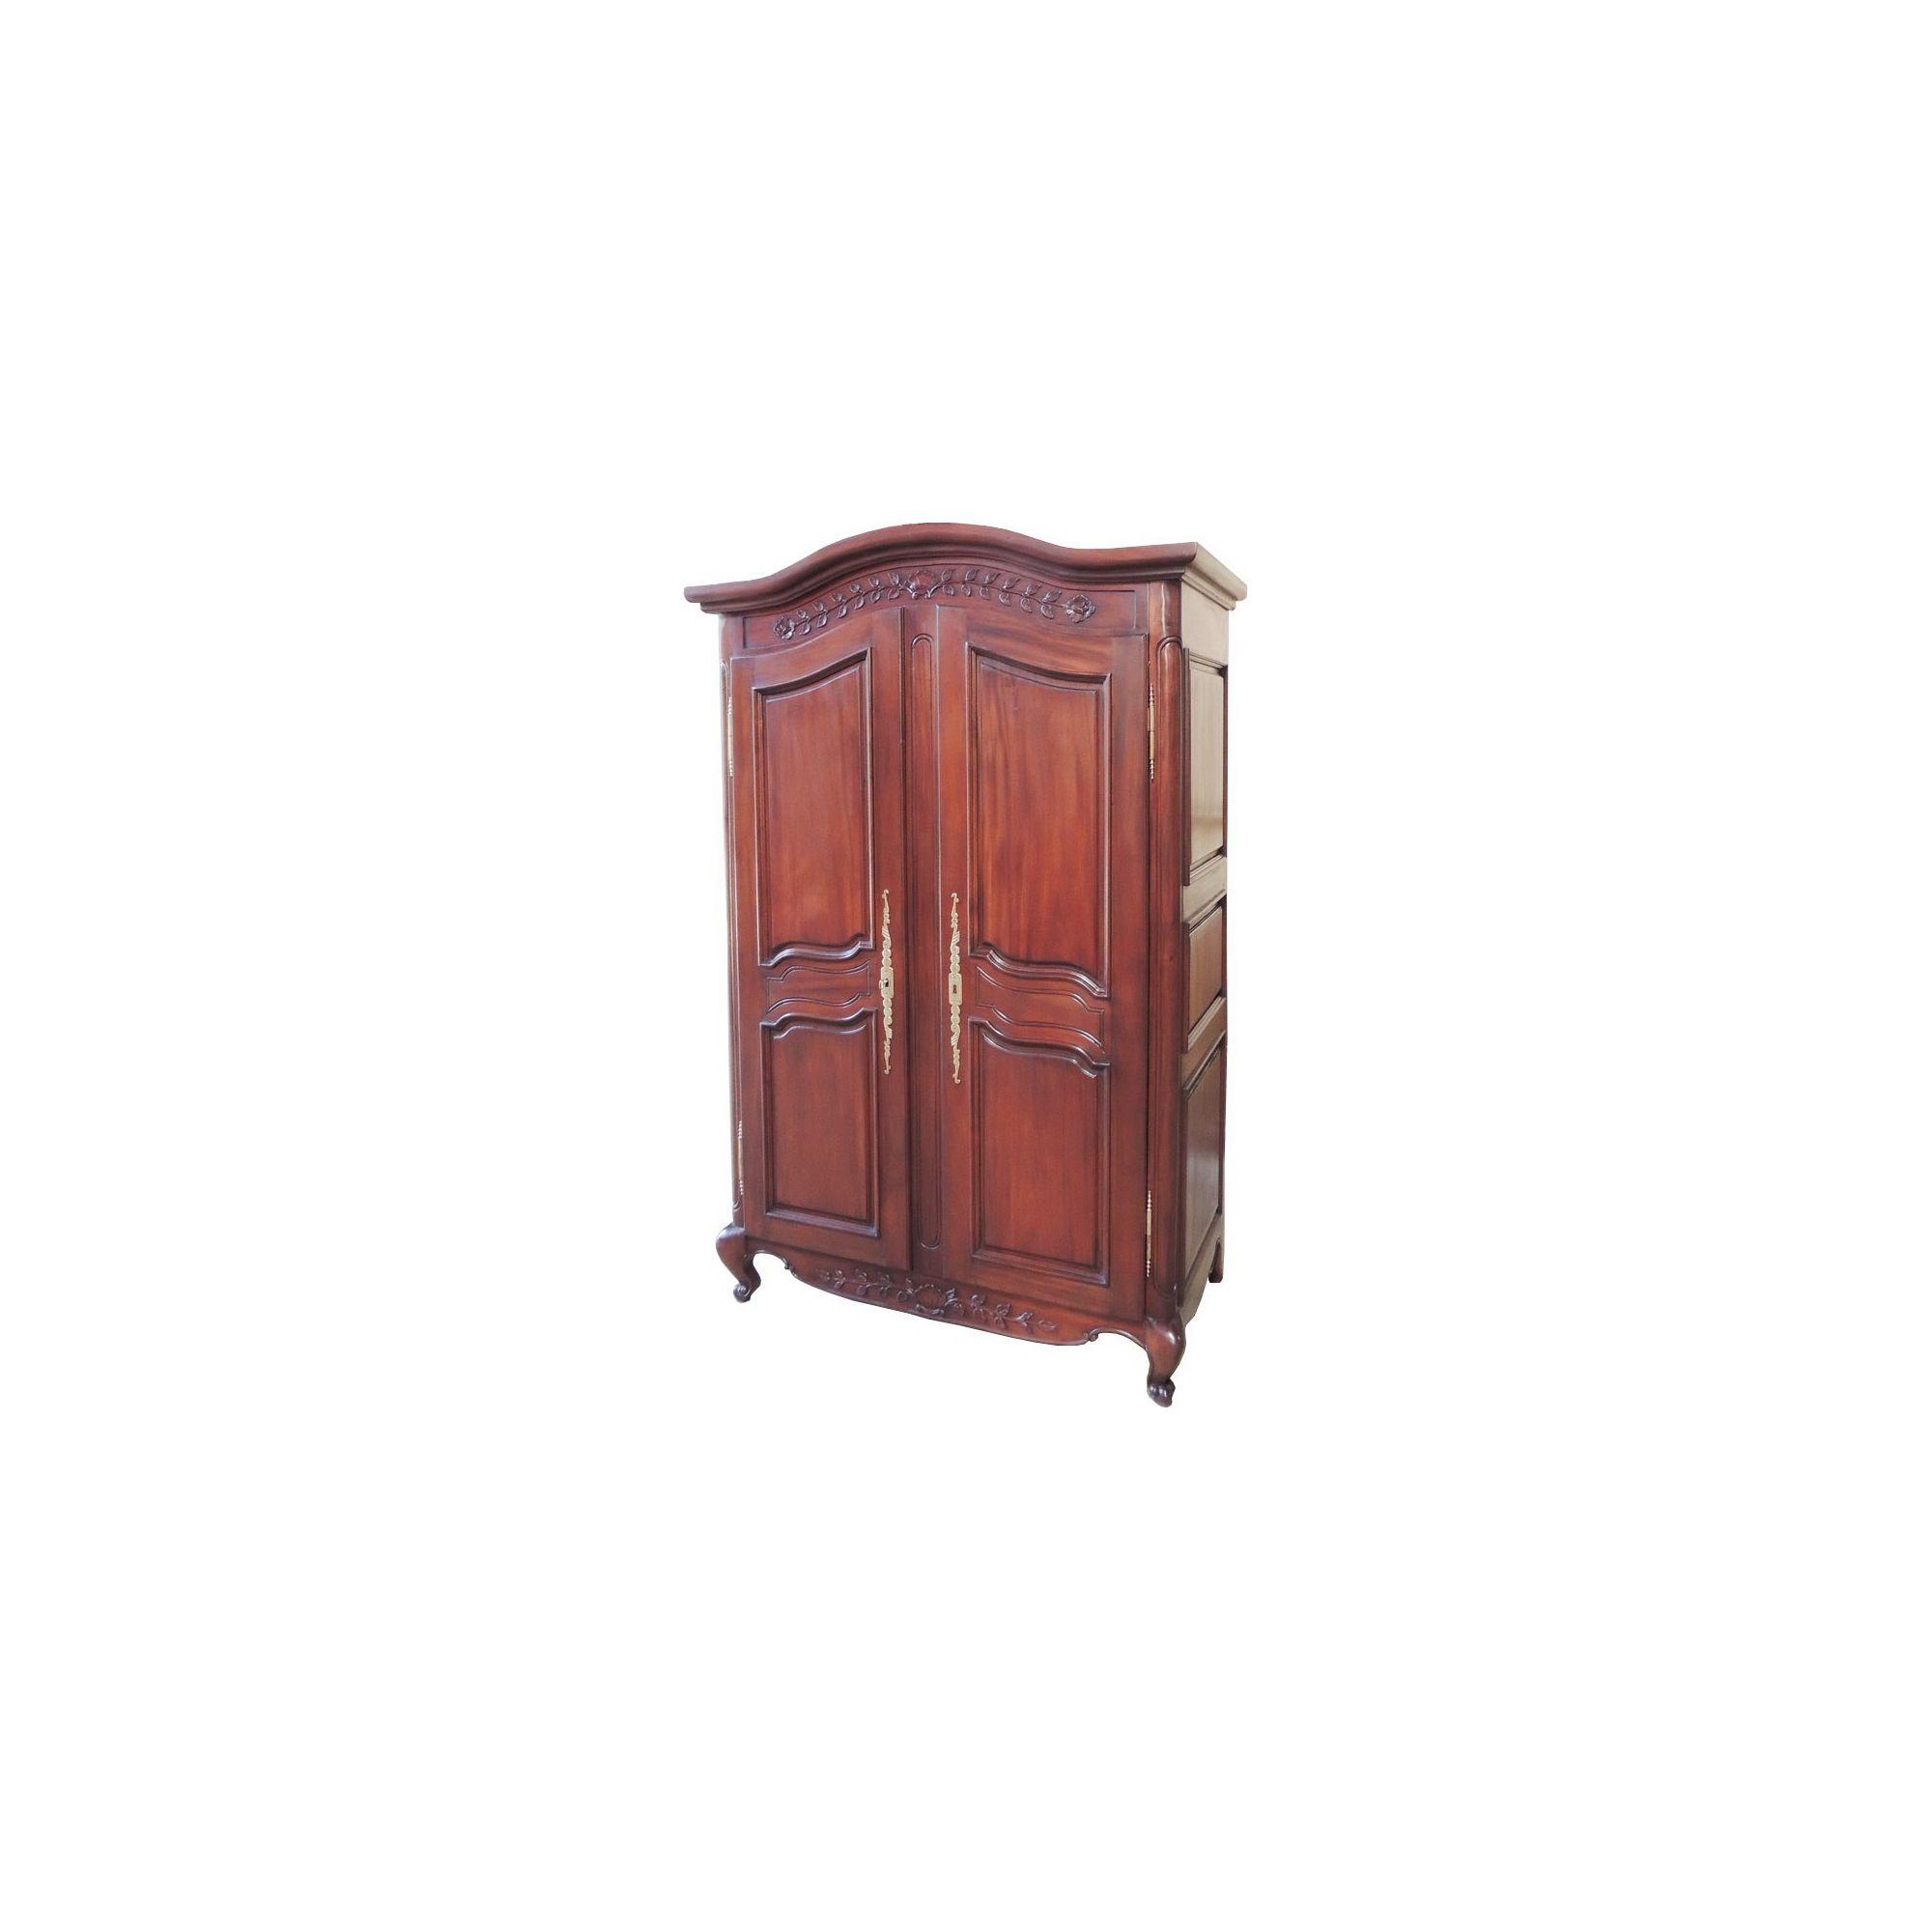 Lock stock and barrel Mahogany Arch Top Armoire with Plain Panels in Mahogany - Wax at Tesco Direct